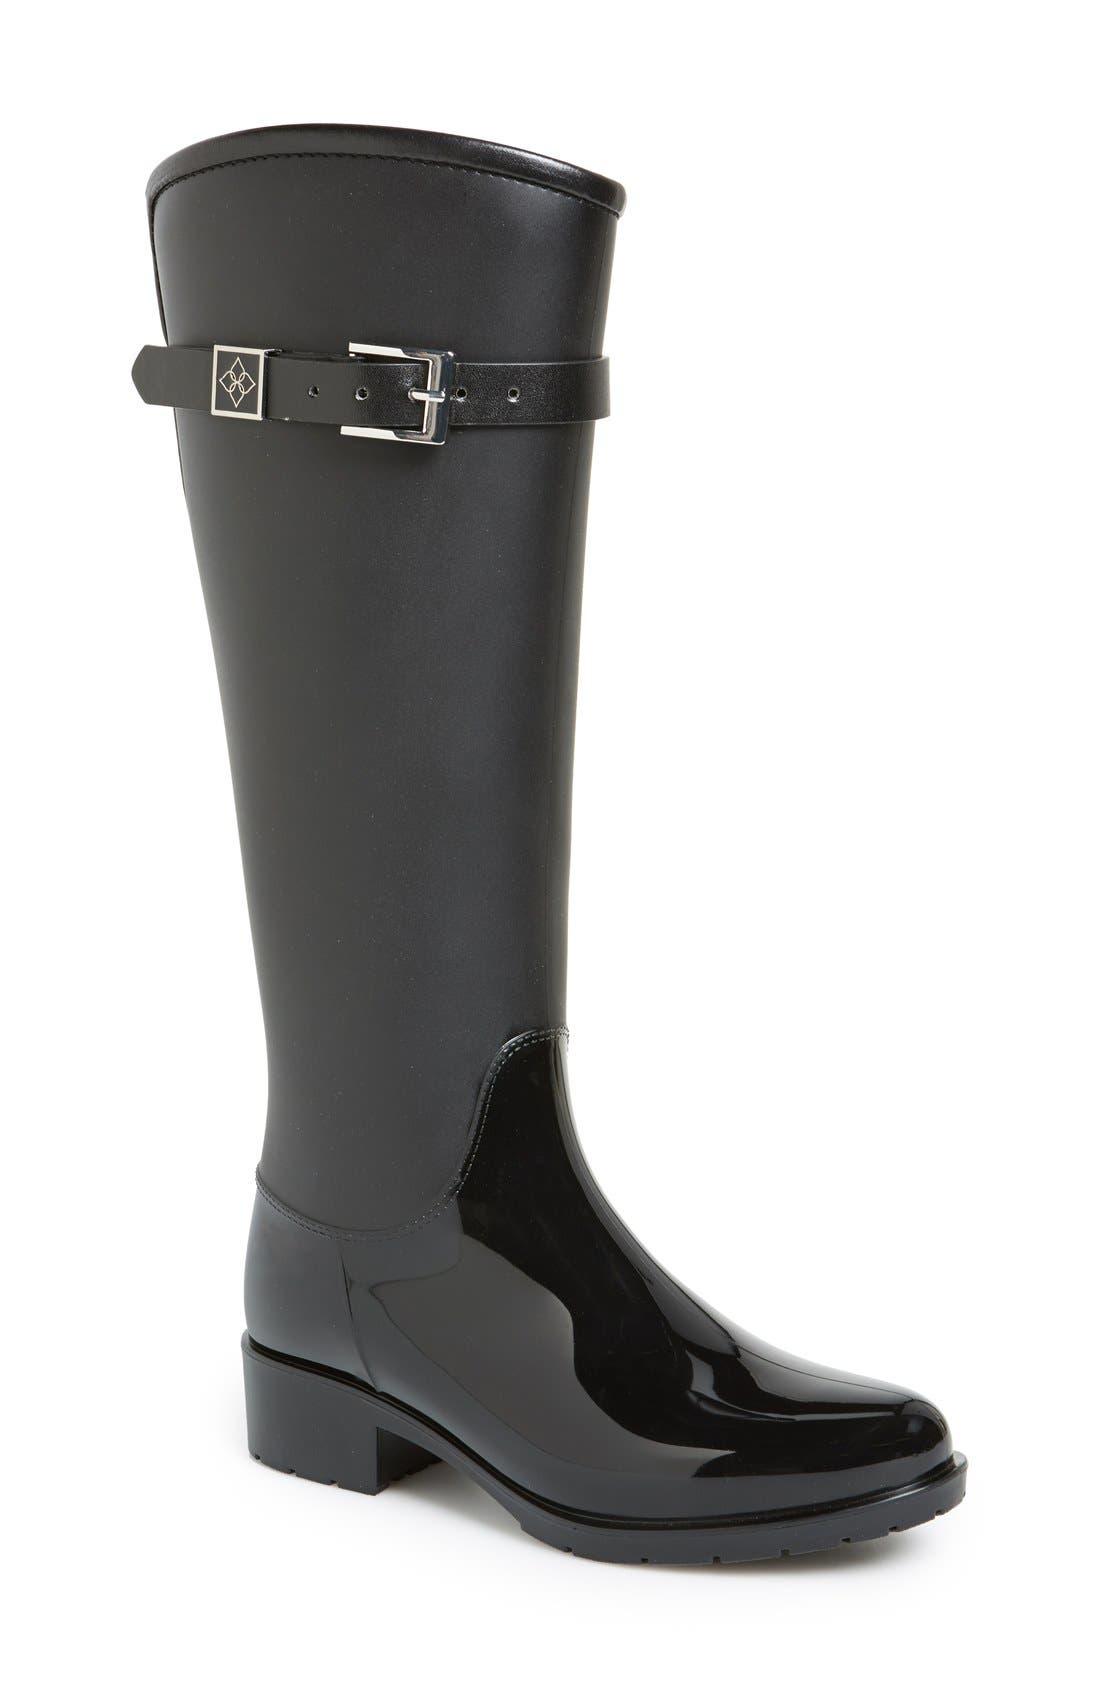 Alternate Image 1 Selected - däv 'Lisbon' Weatherproof Knee High Rain Boot (Women)